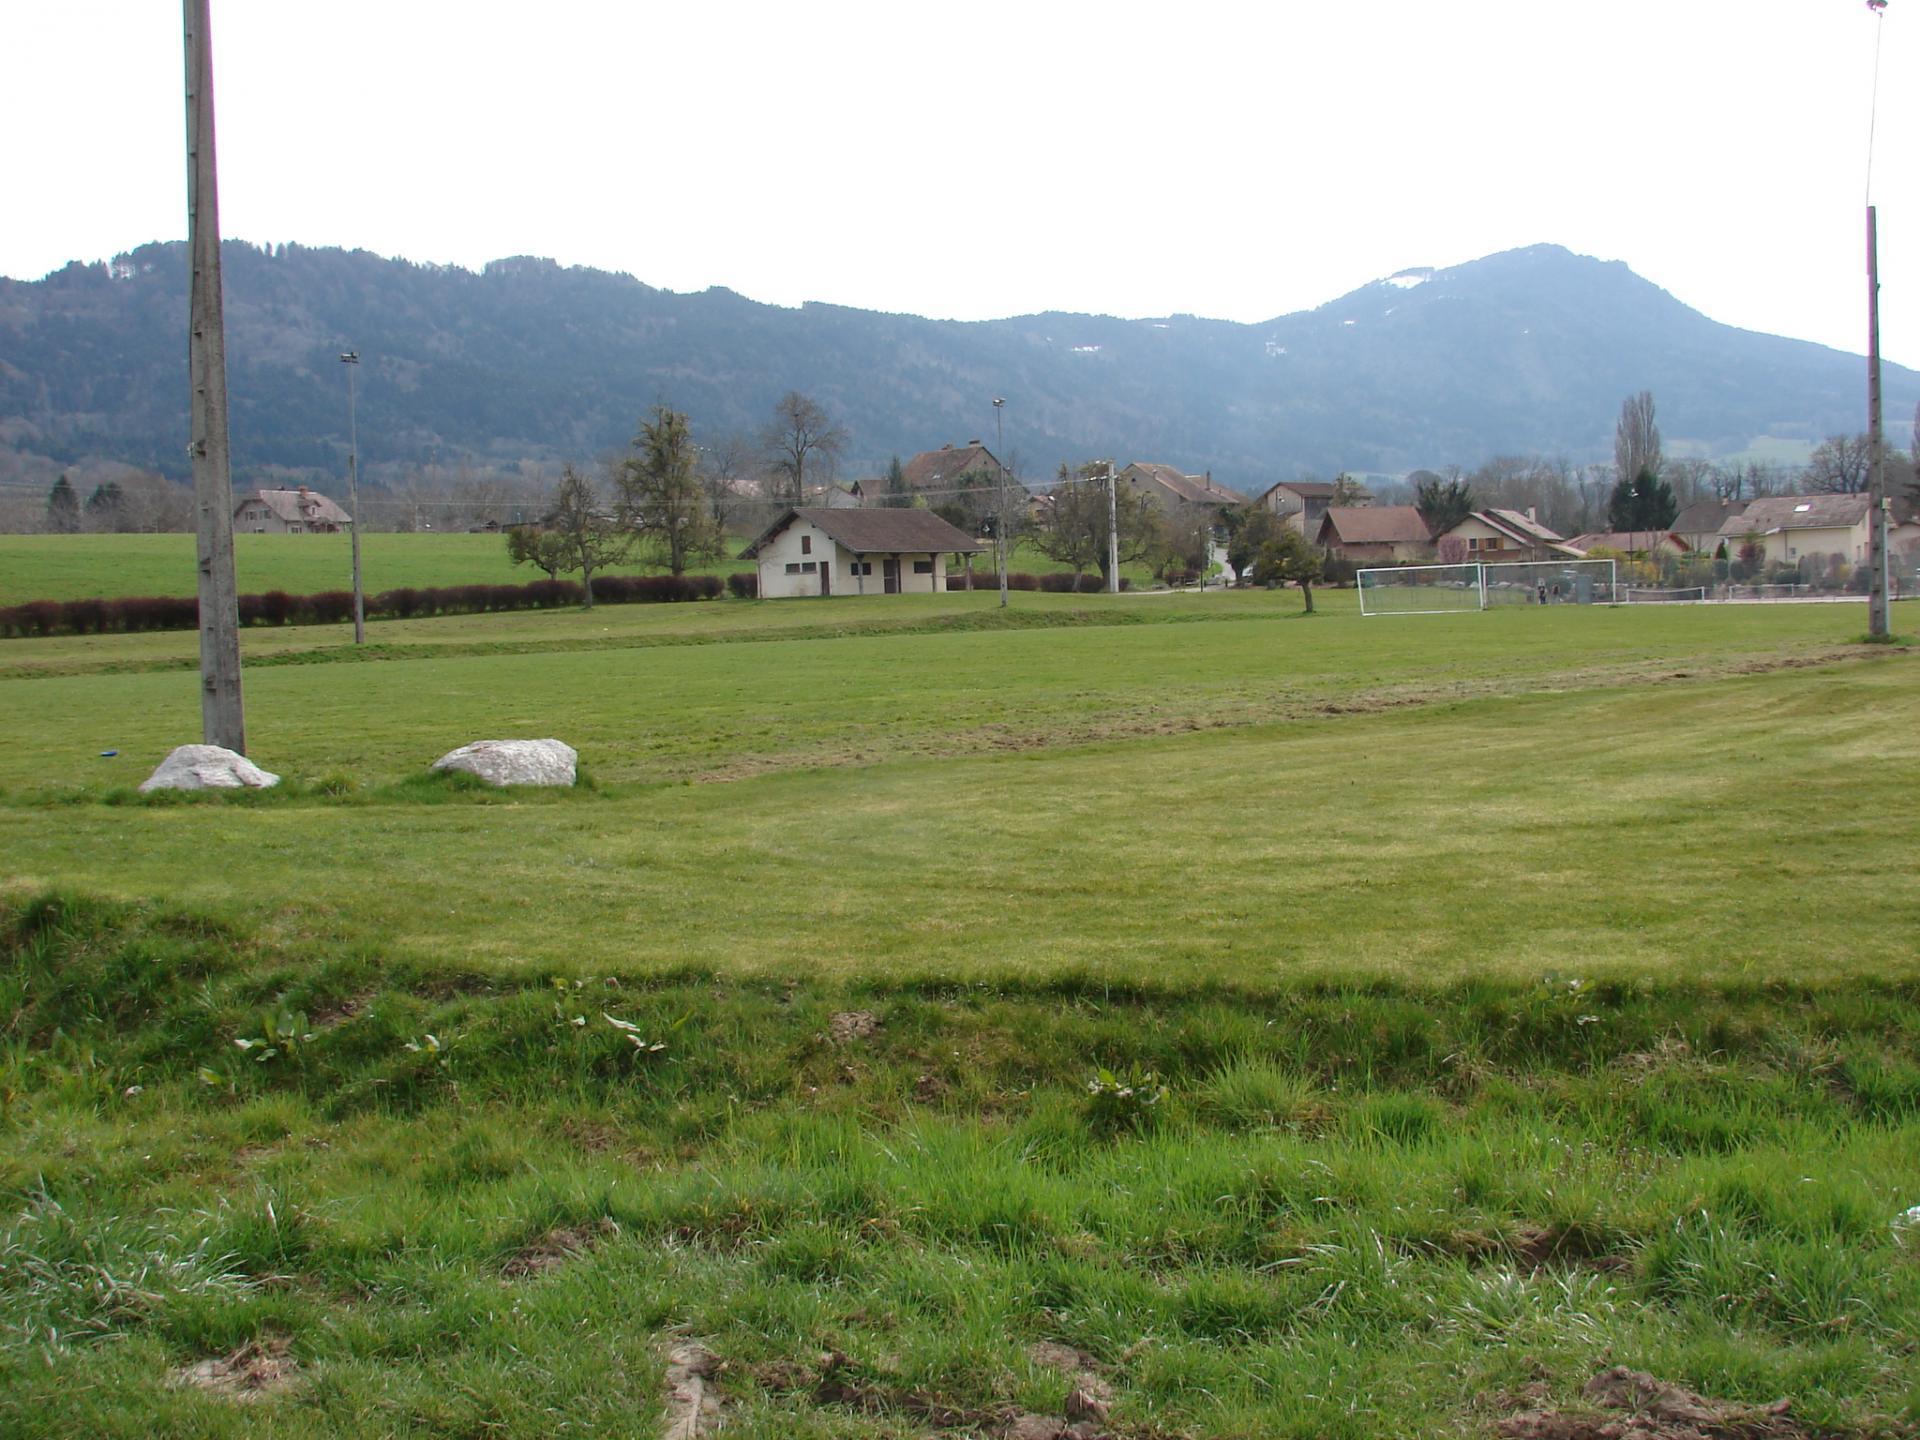 Son terrain de foot